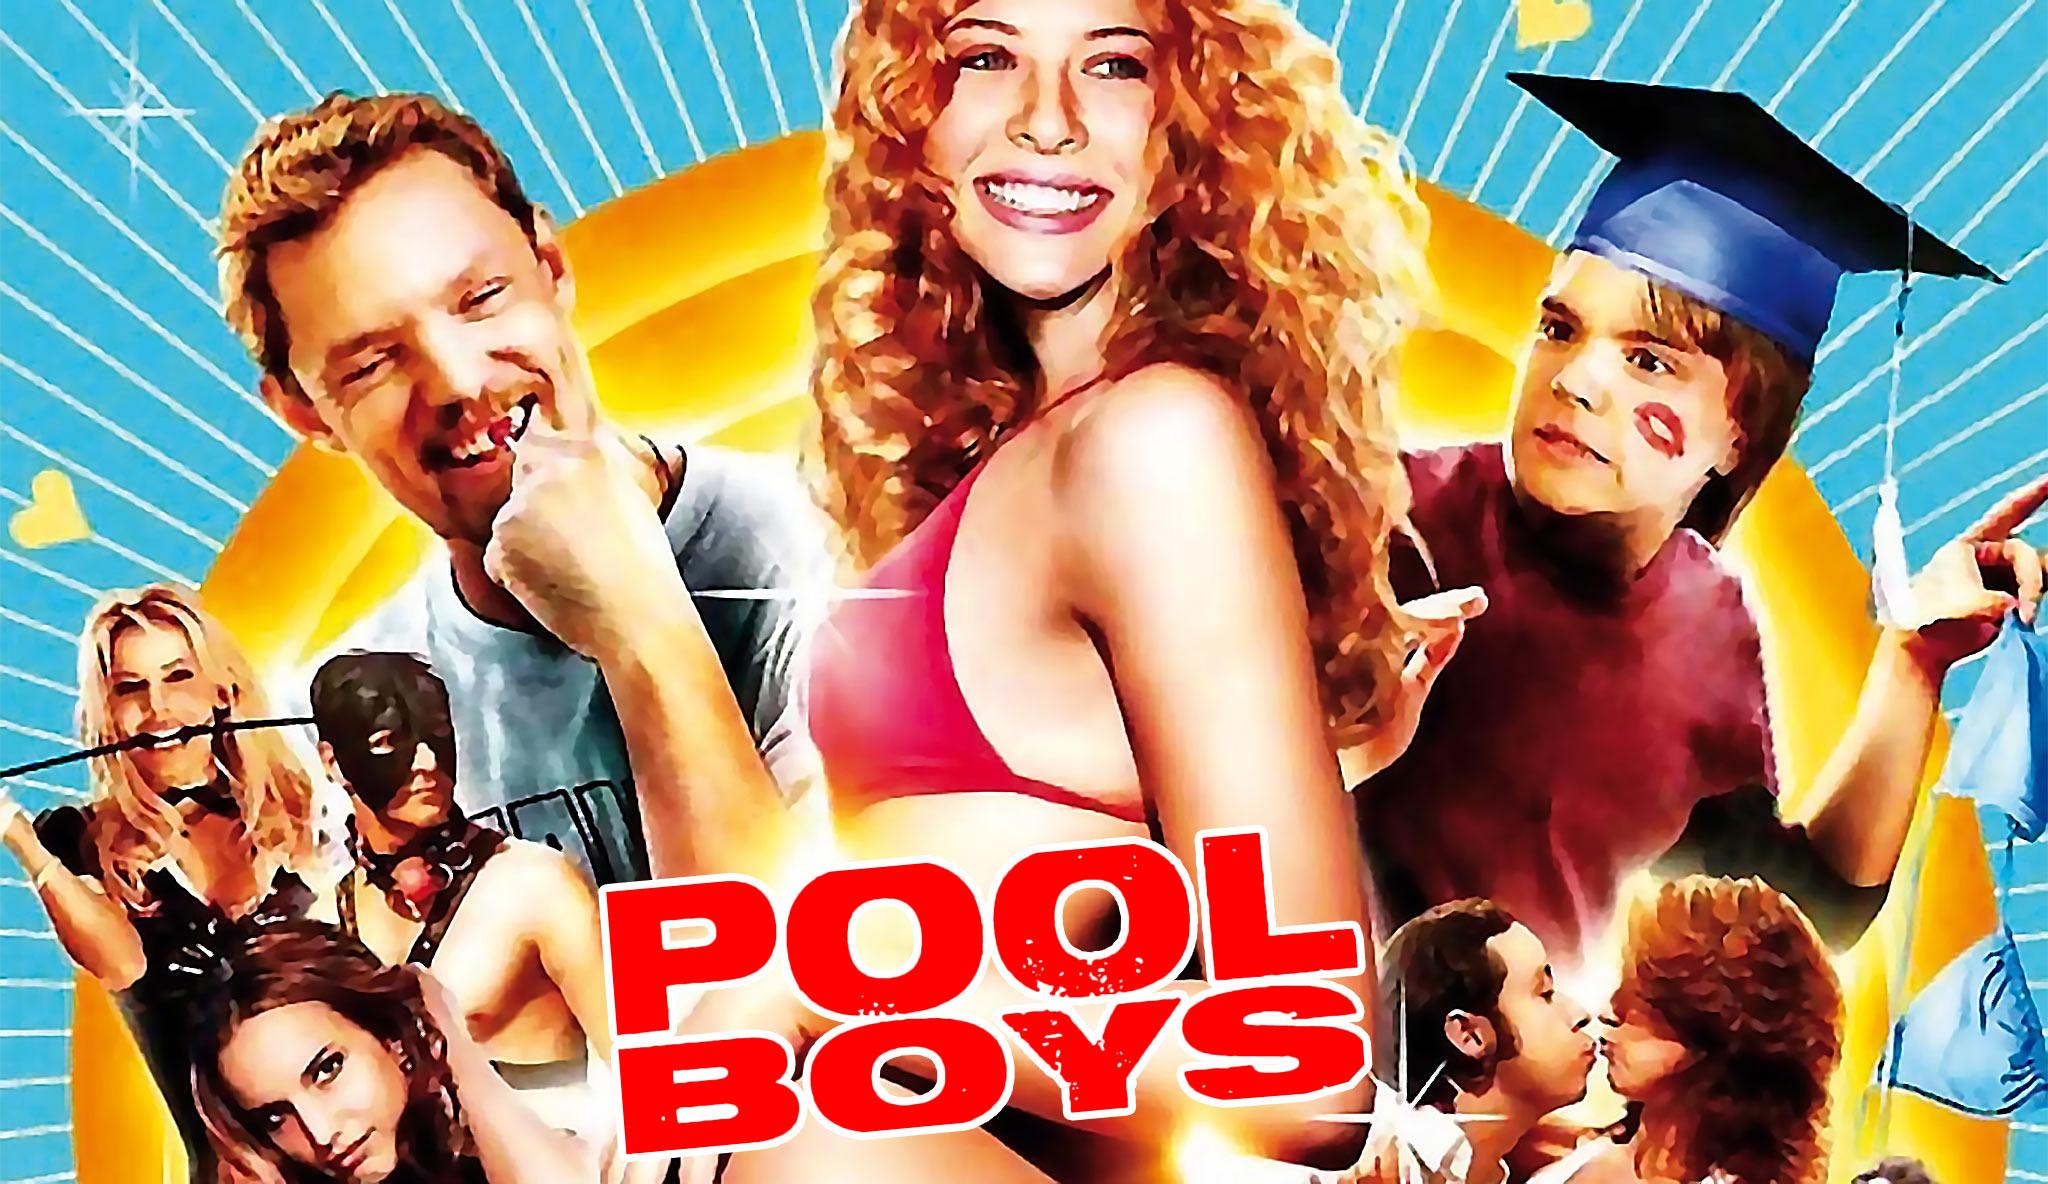 pool-boys\header.jpg